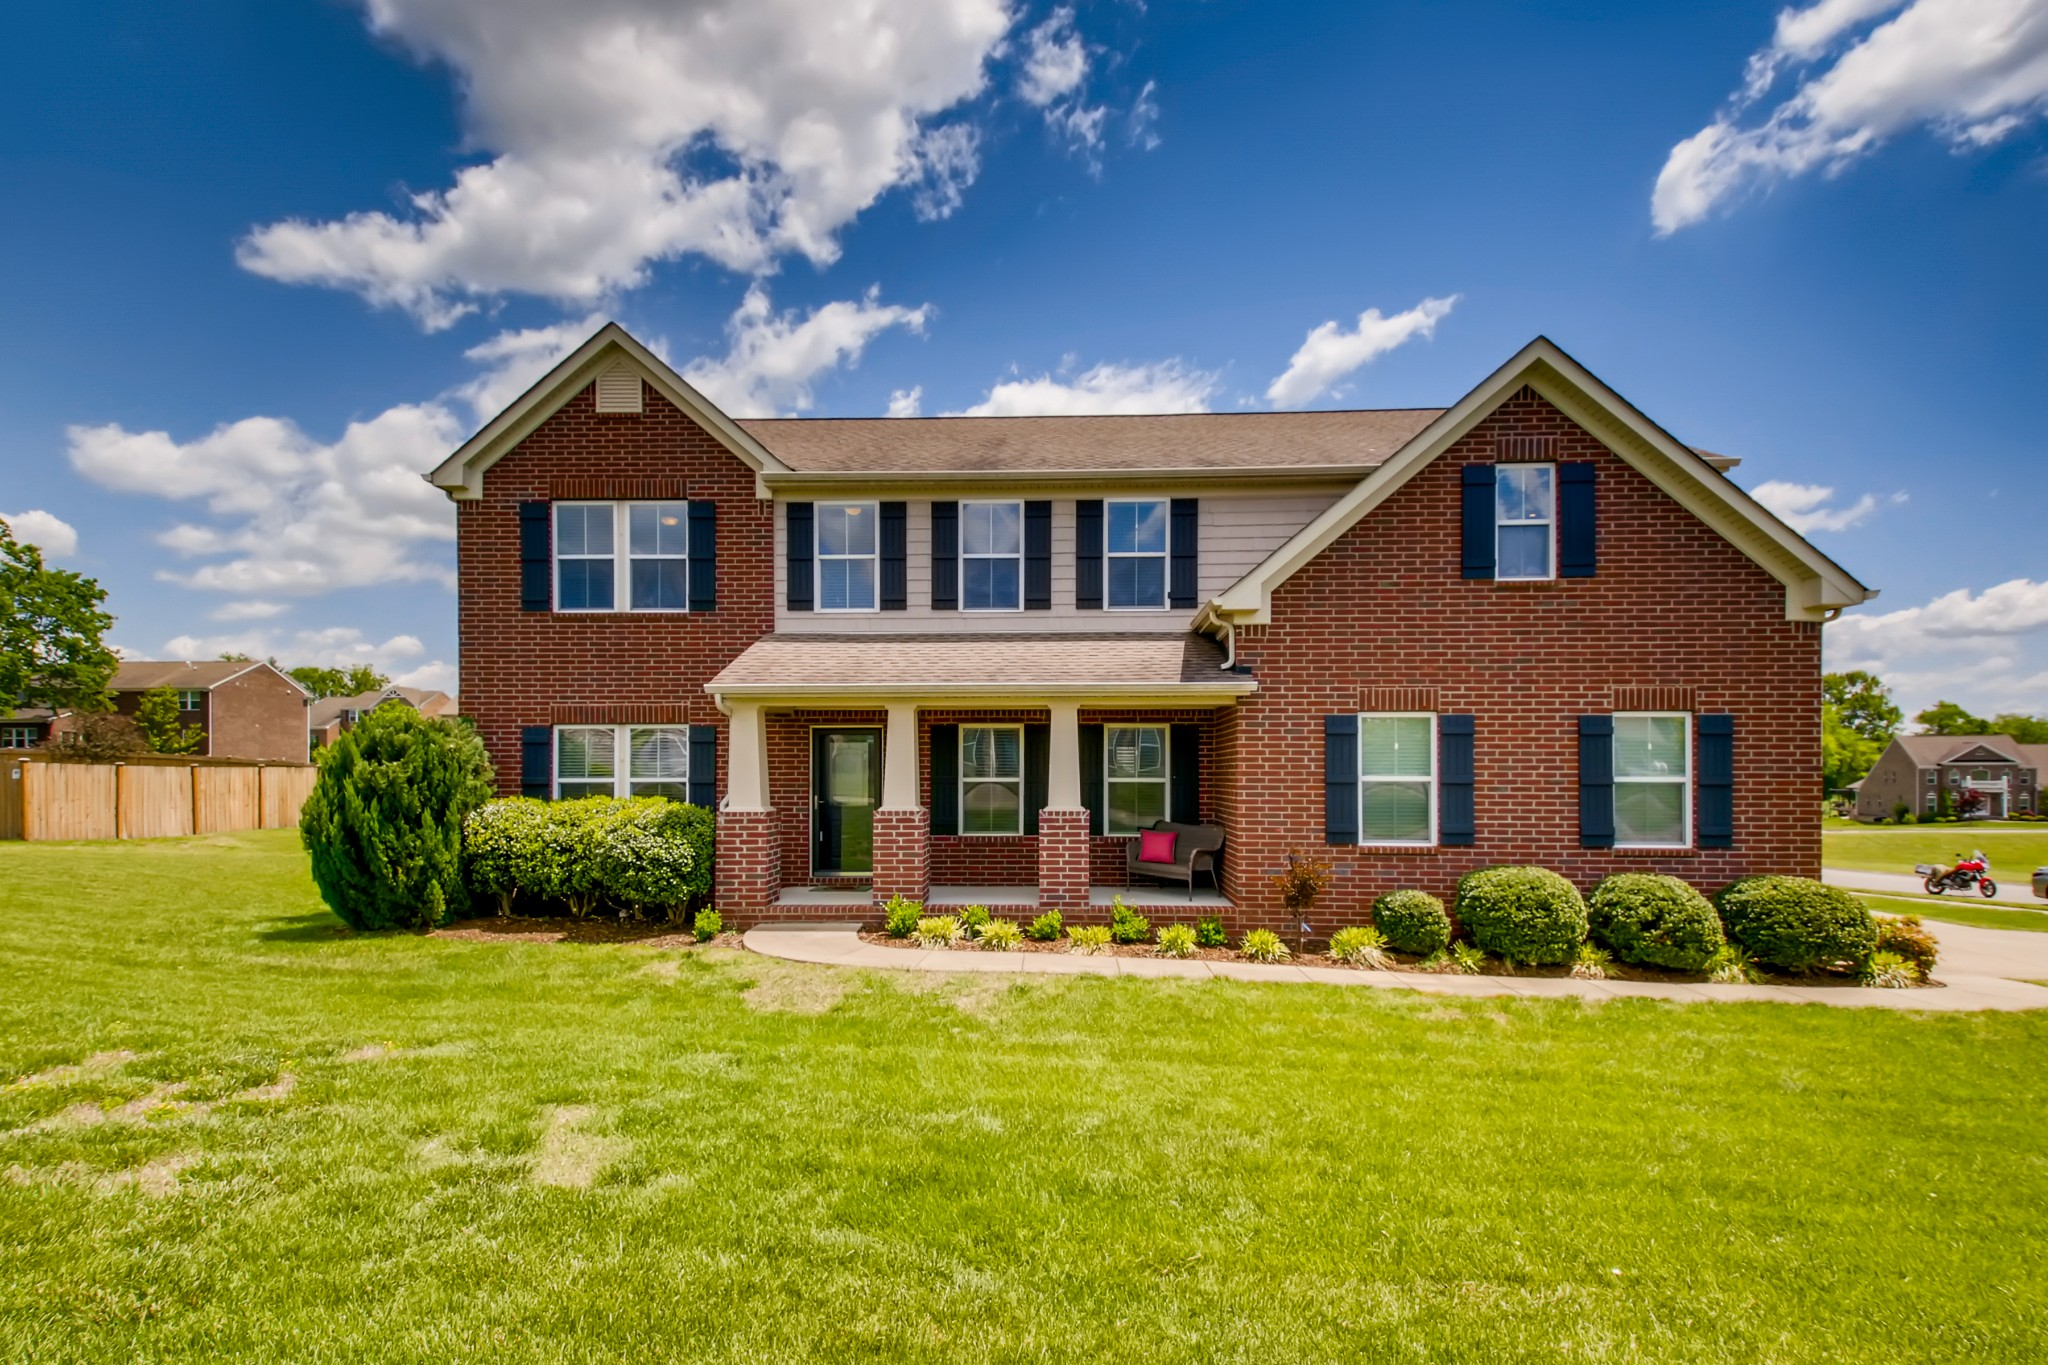 357 Fannis Cir Property Photo - Gallatin, TN real estate listing